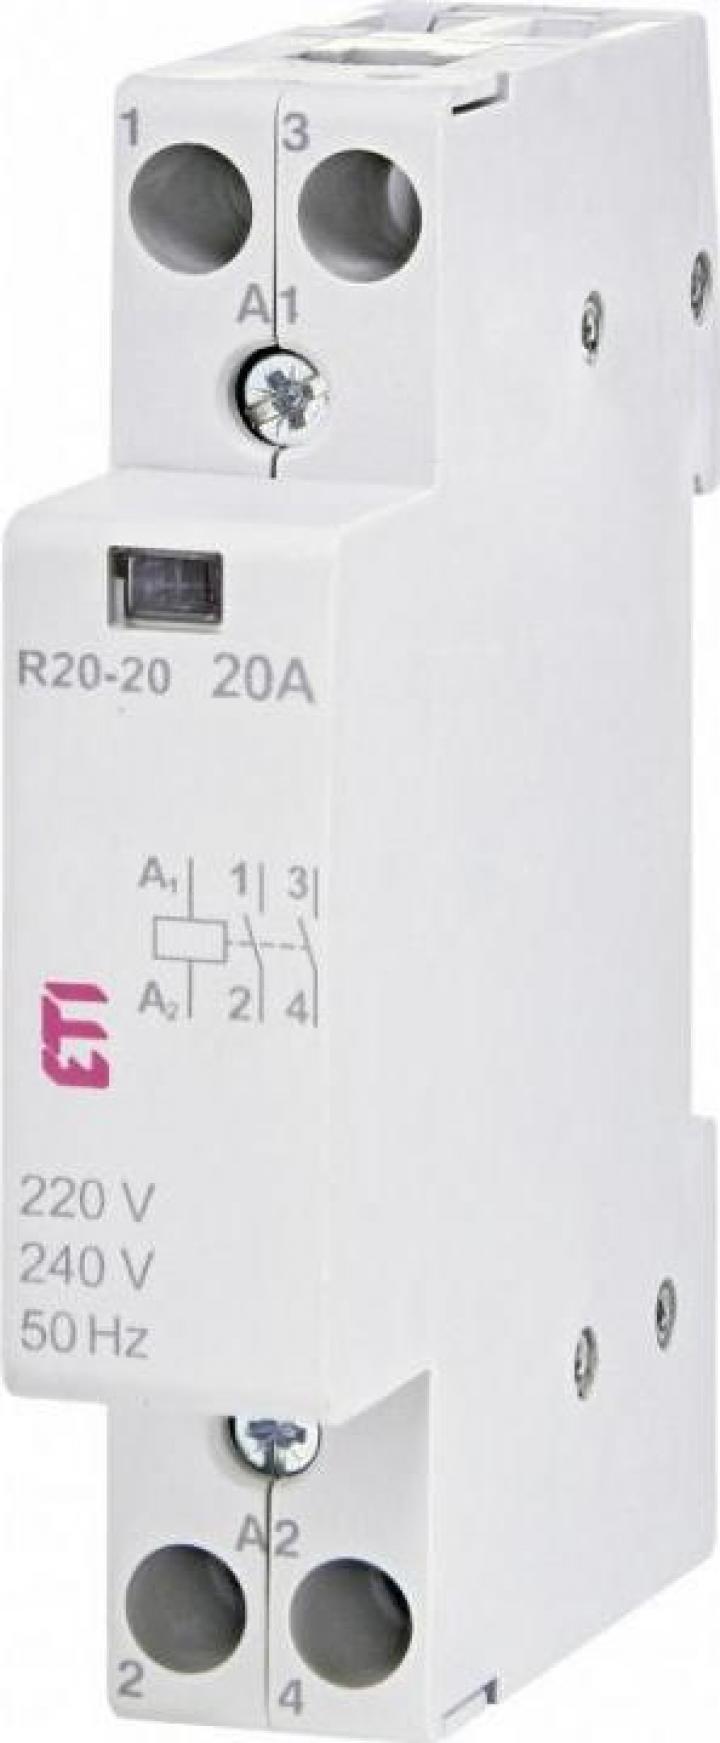 Contactor modular R 20-20 230V, ETI